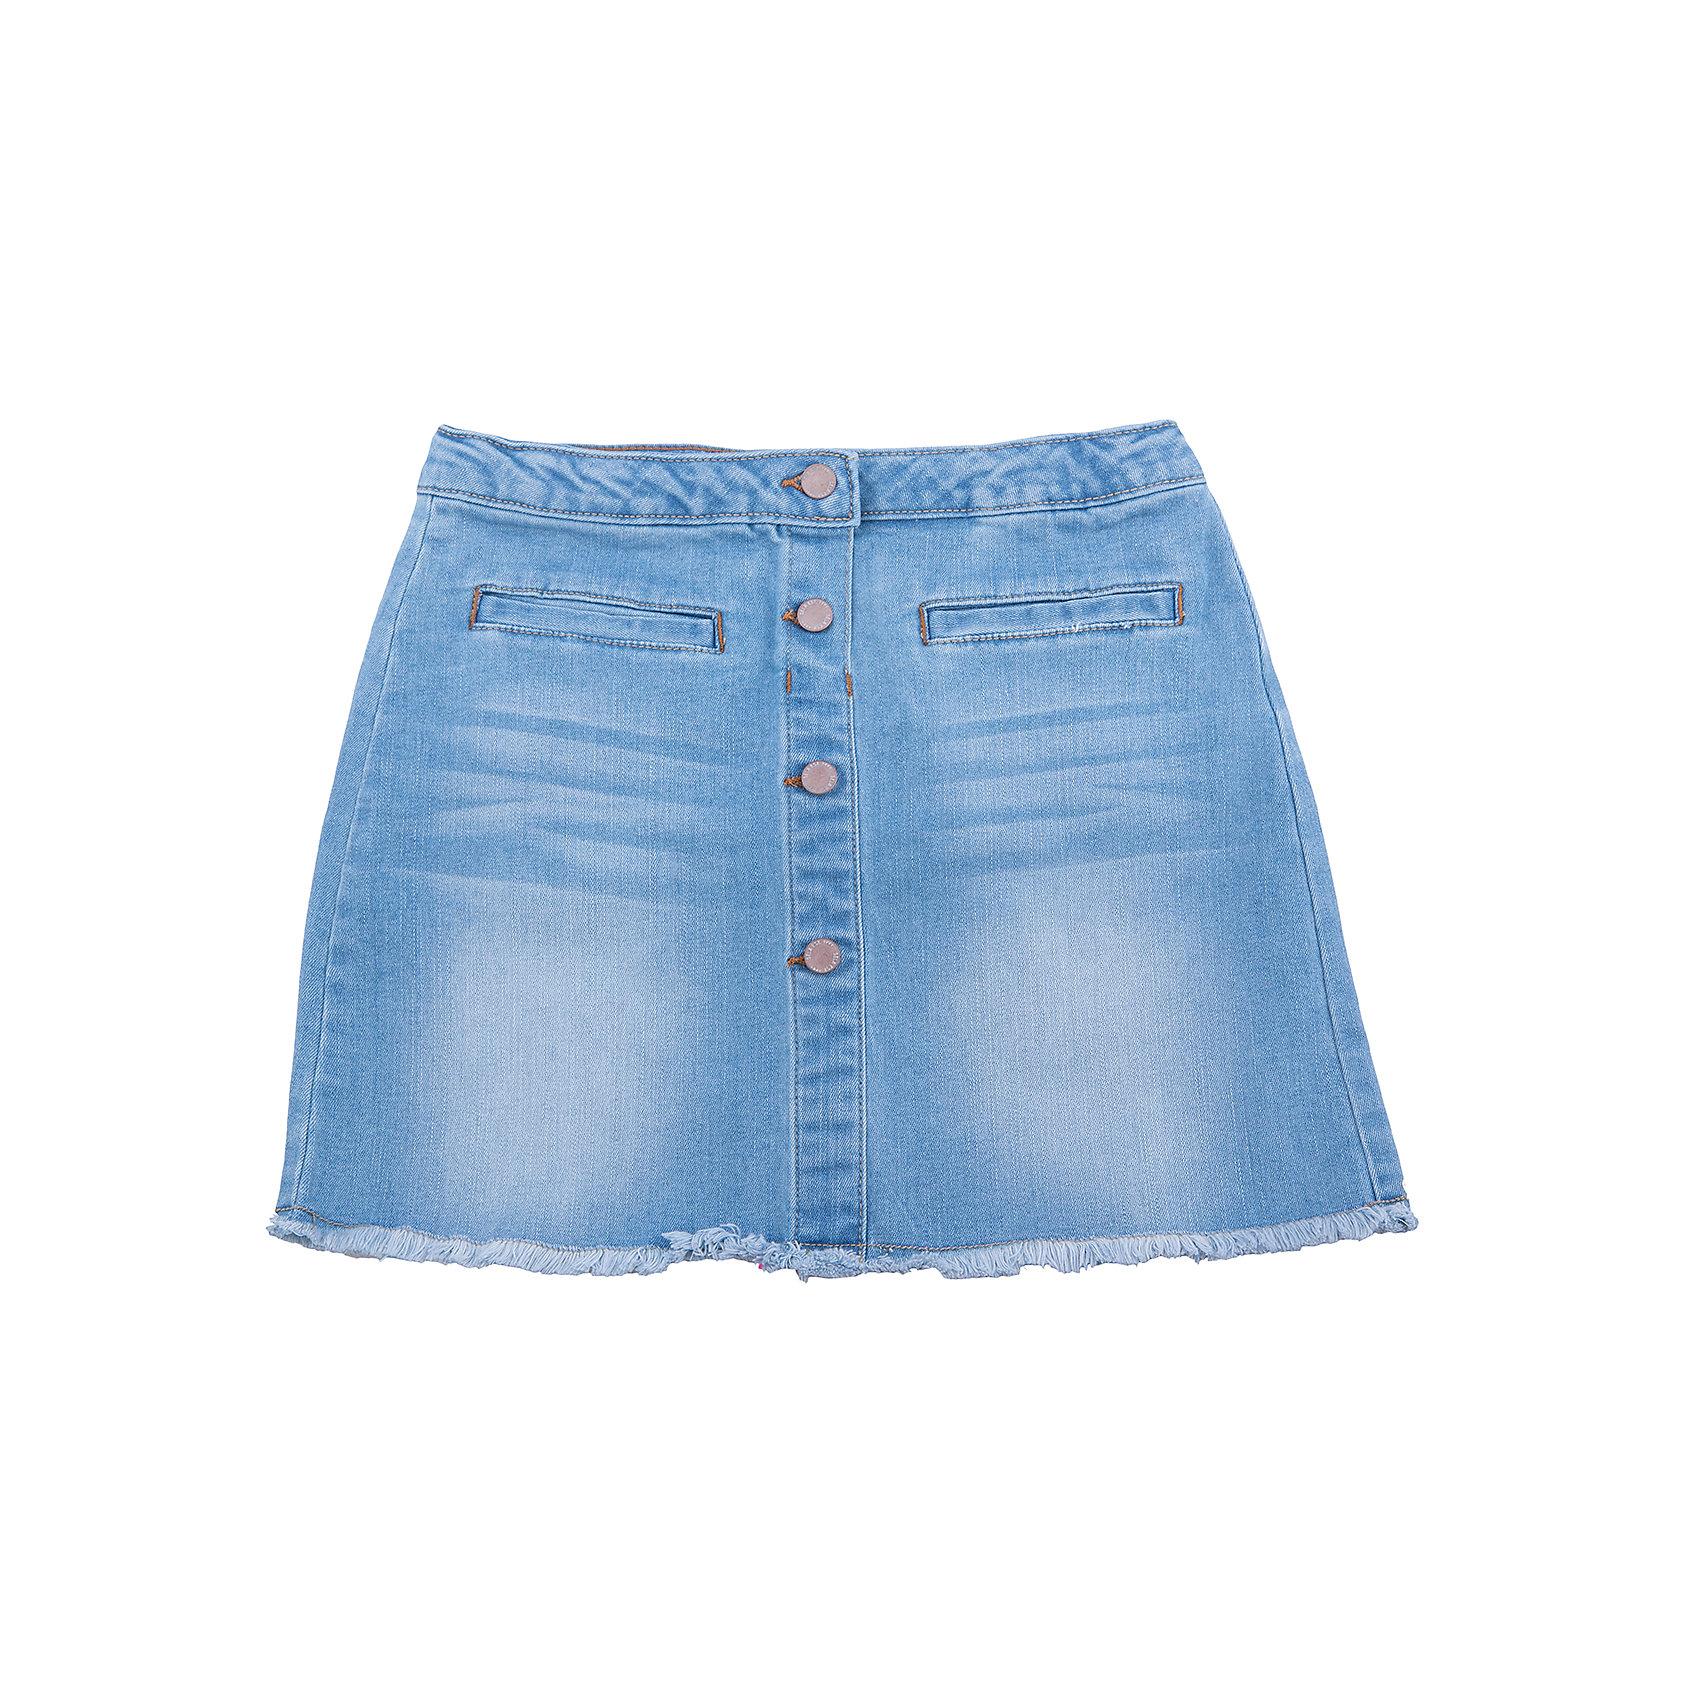 Юбка джинсовая для девочки SELAЮбки<br>Юбка джинсовая для девочки от известного бренда SELA<br>Состав:<br>63% хлопок, 23% ПЭ, 12% вискоза, 2% эластан<br><br>Ширина мм: 207<br>Глубина мм: 10<br>Высота мм: 189<br>Вес г: 183<br>Цвет: синий<br>Возраст от месяцев: 96<br>Возраст до месяцев: 108<br>Пол: Женский<br>Возраст: Детский<br>Размер: 134,122,140,146,152,116,128<br>SKU: 5306173